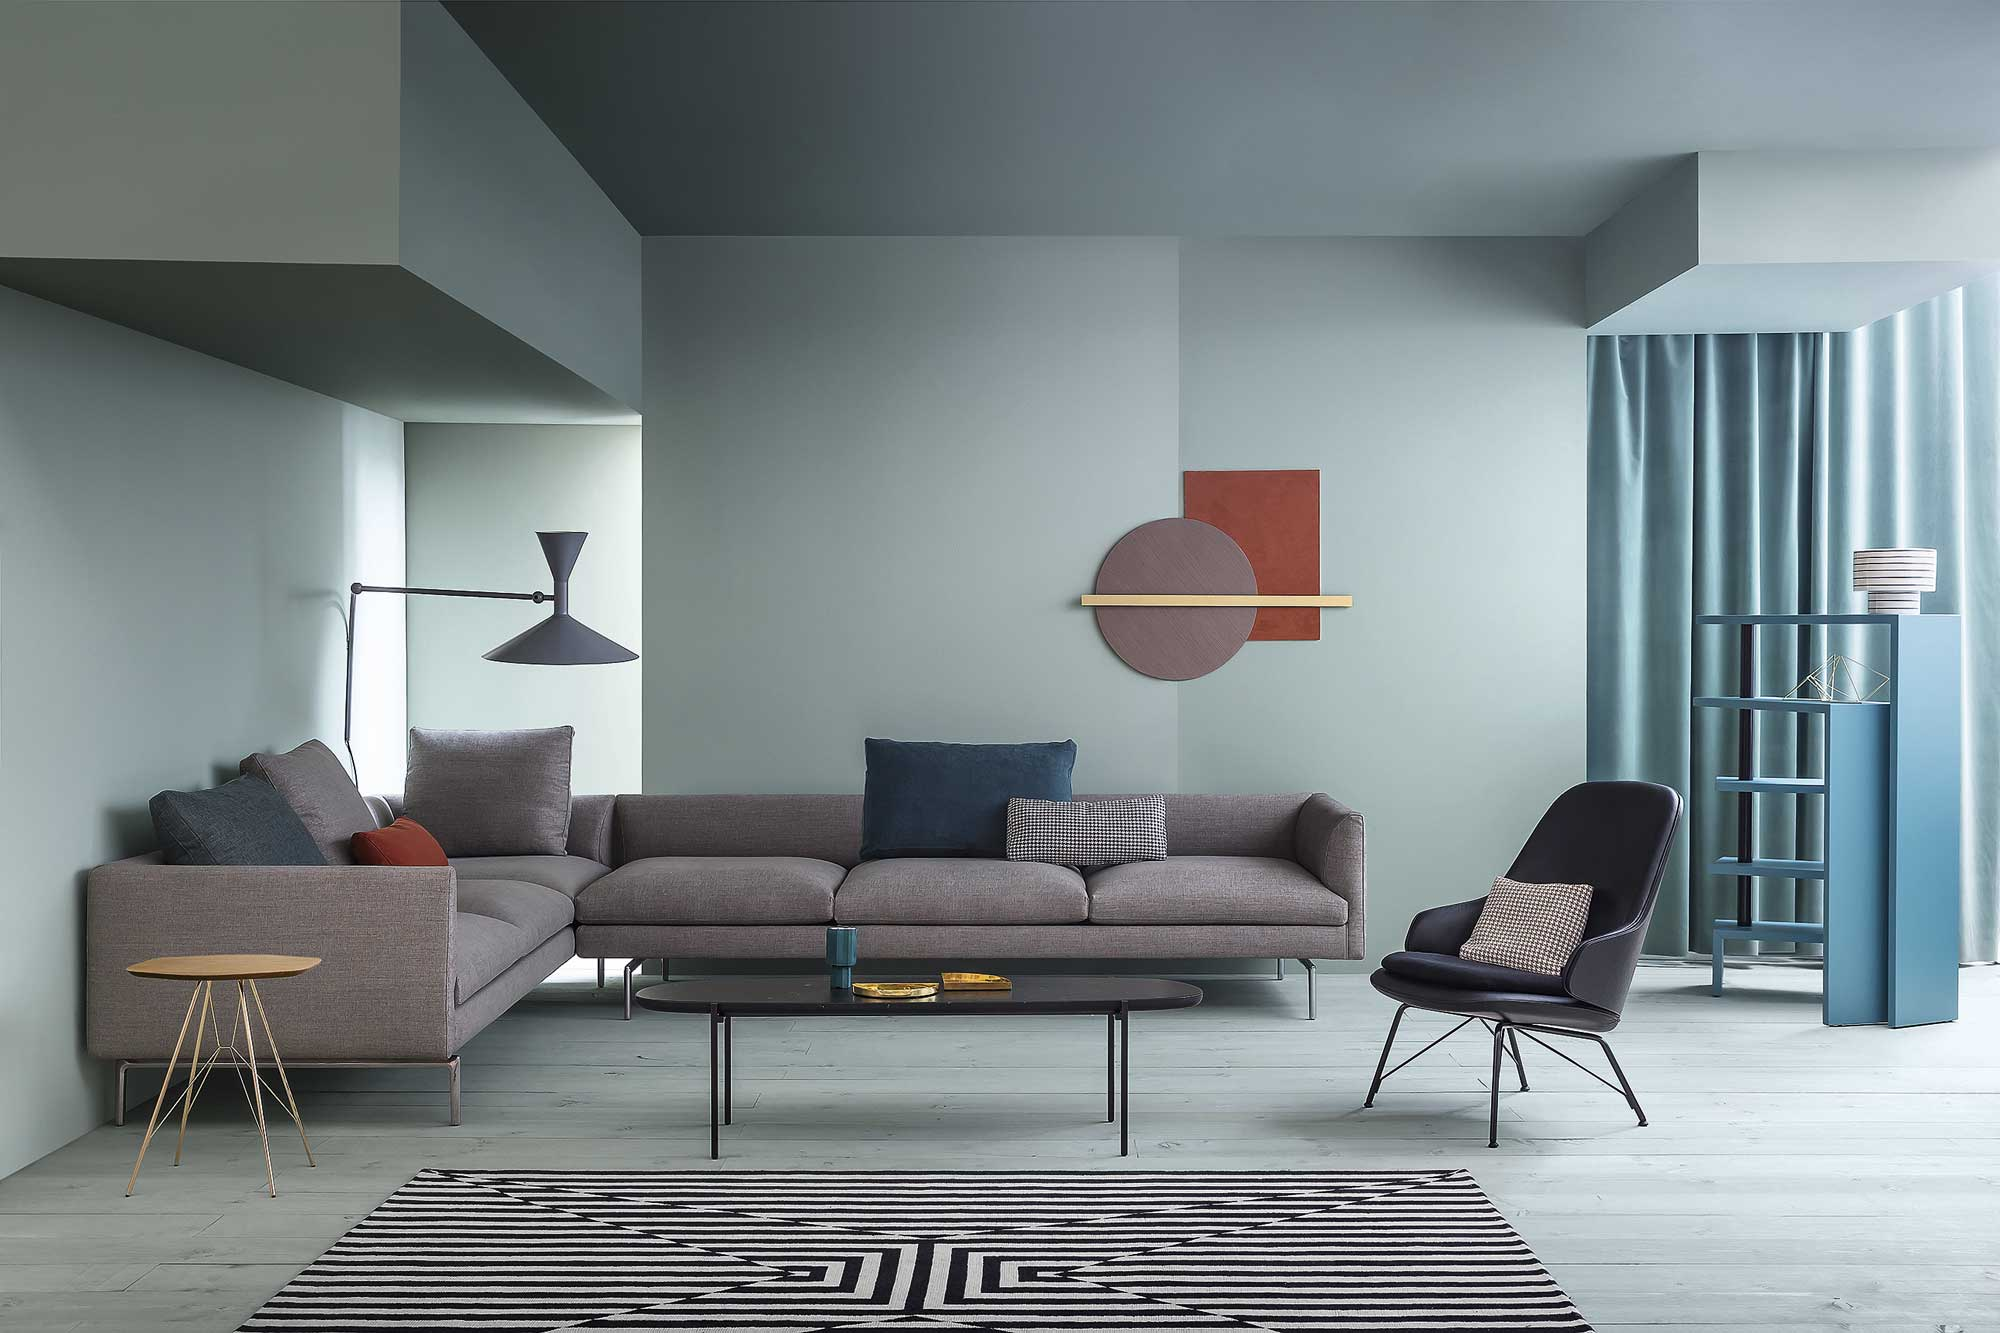 Empresa de dise o de interiores en madrid studio staff - Empresa diseno de interiores ...